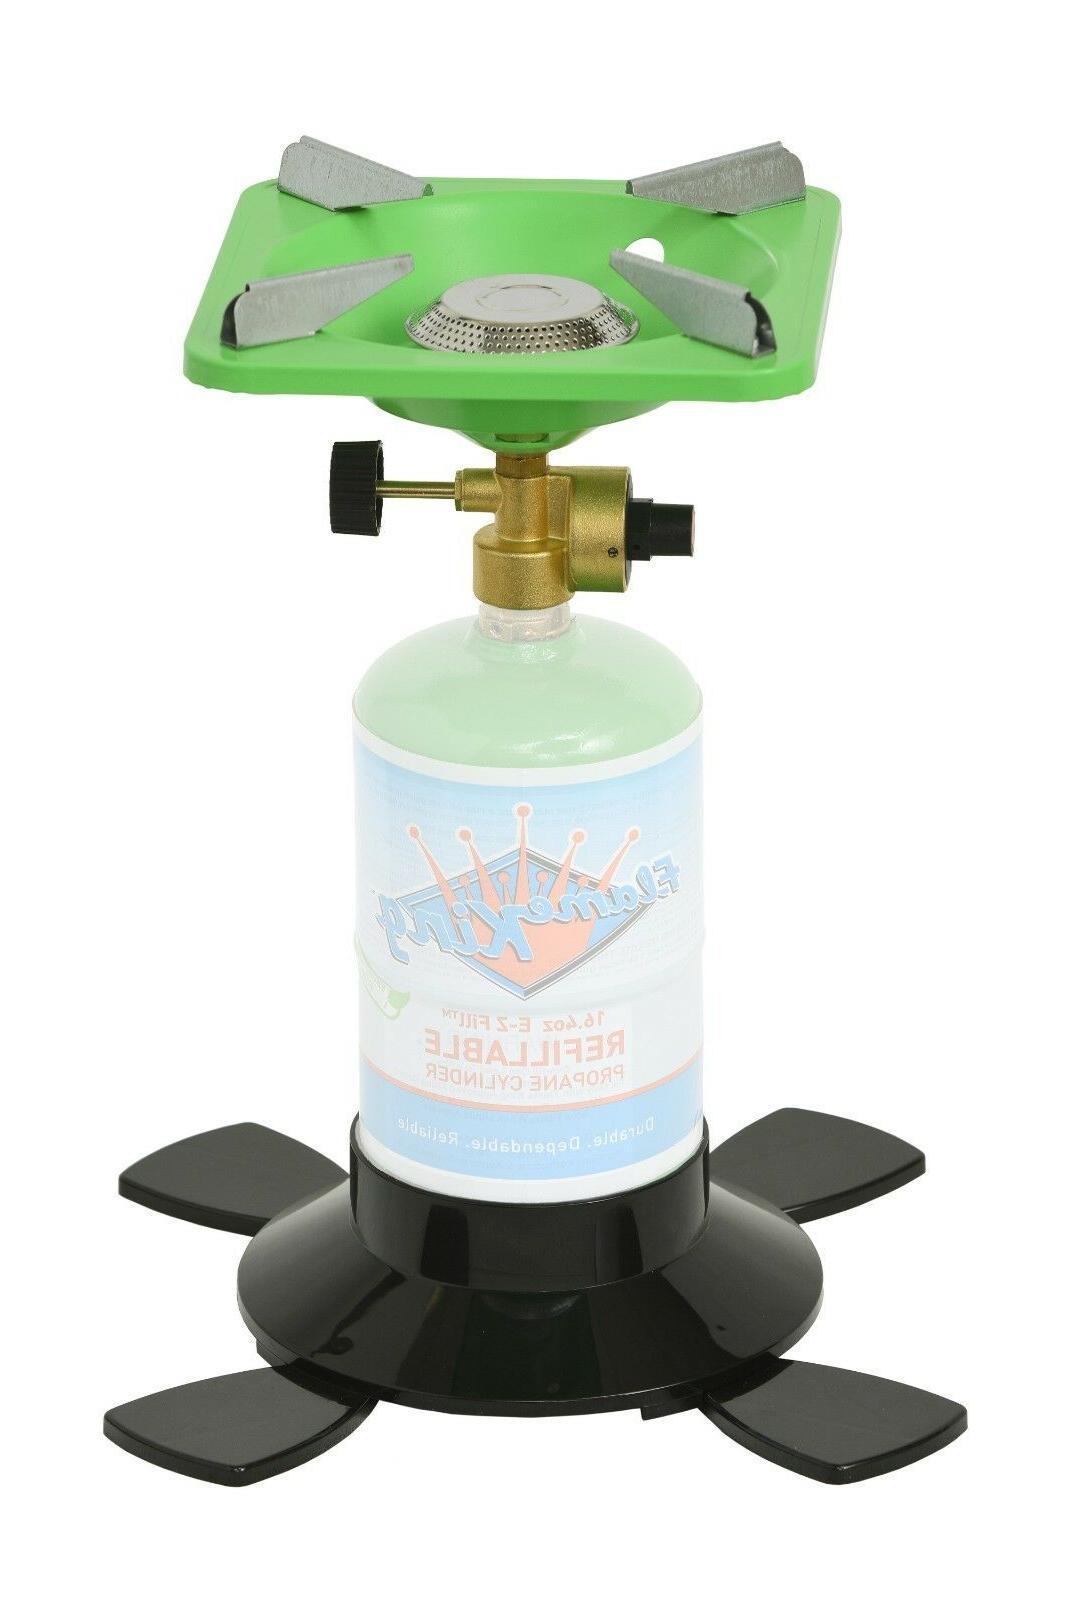 single burner portable camping stove with base